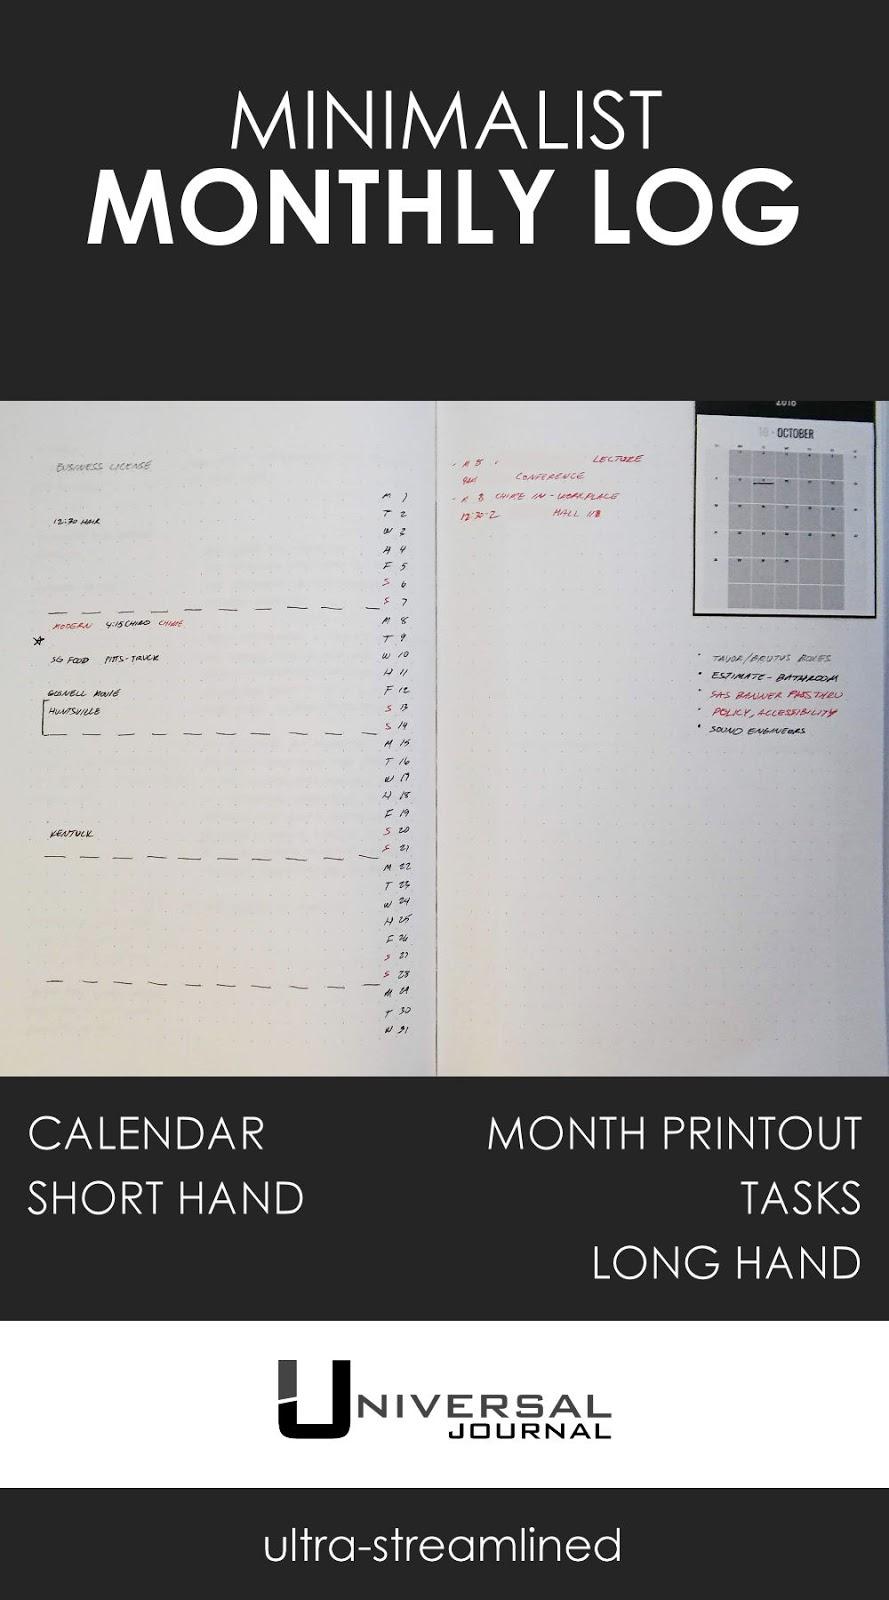 monthly log minimalist